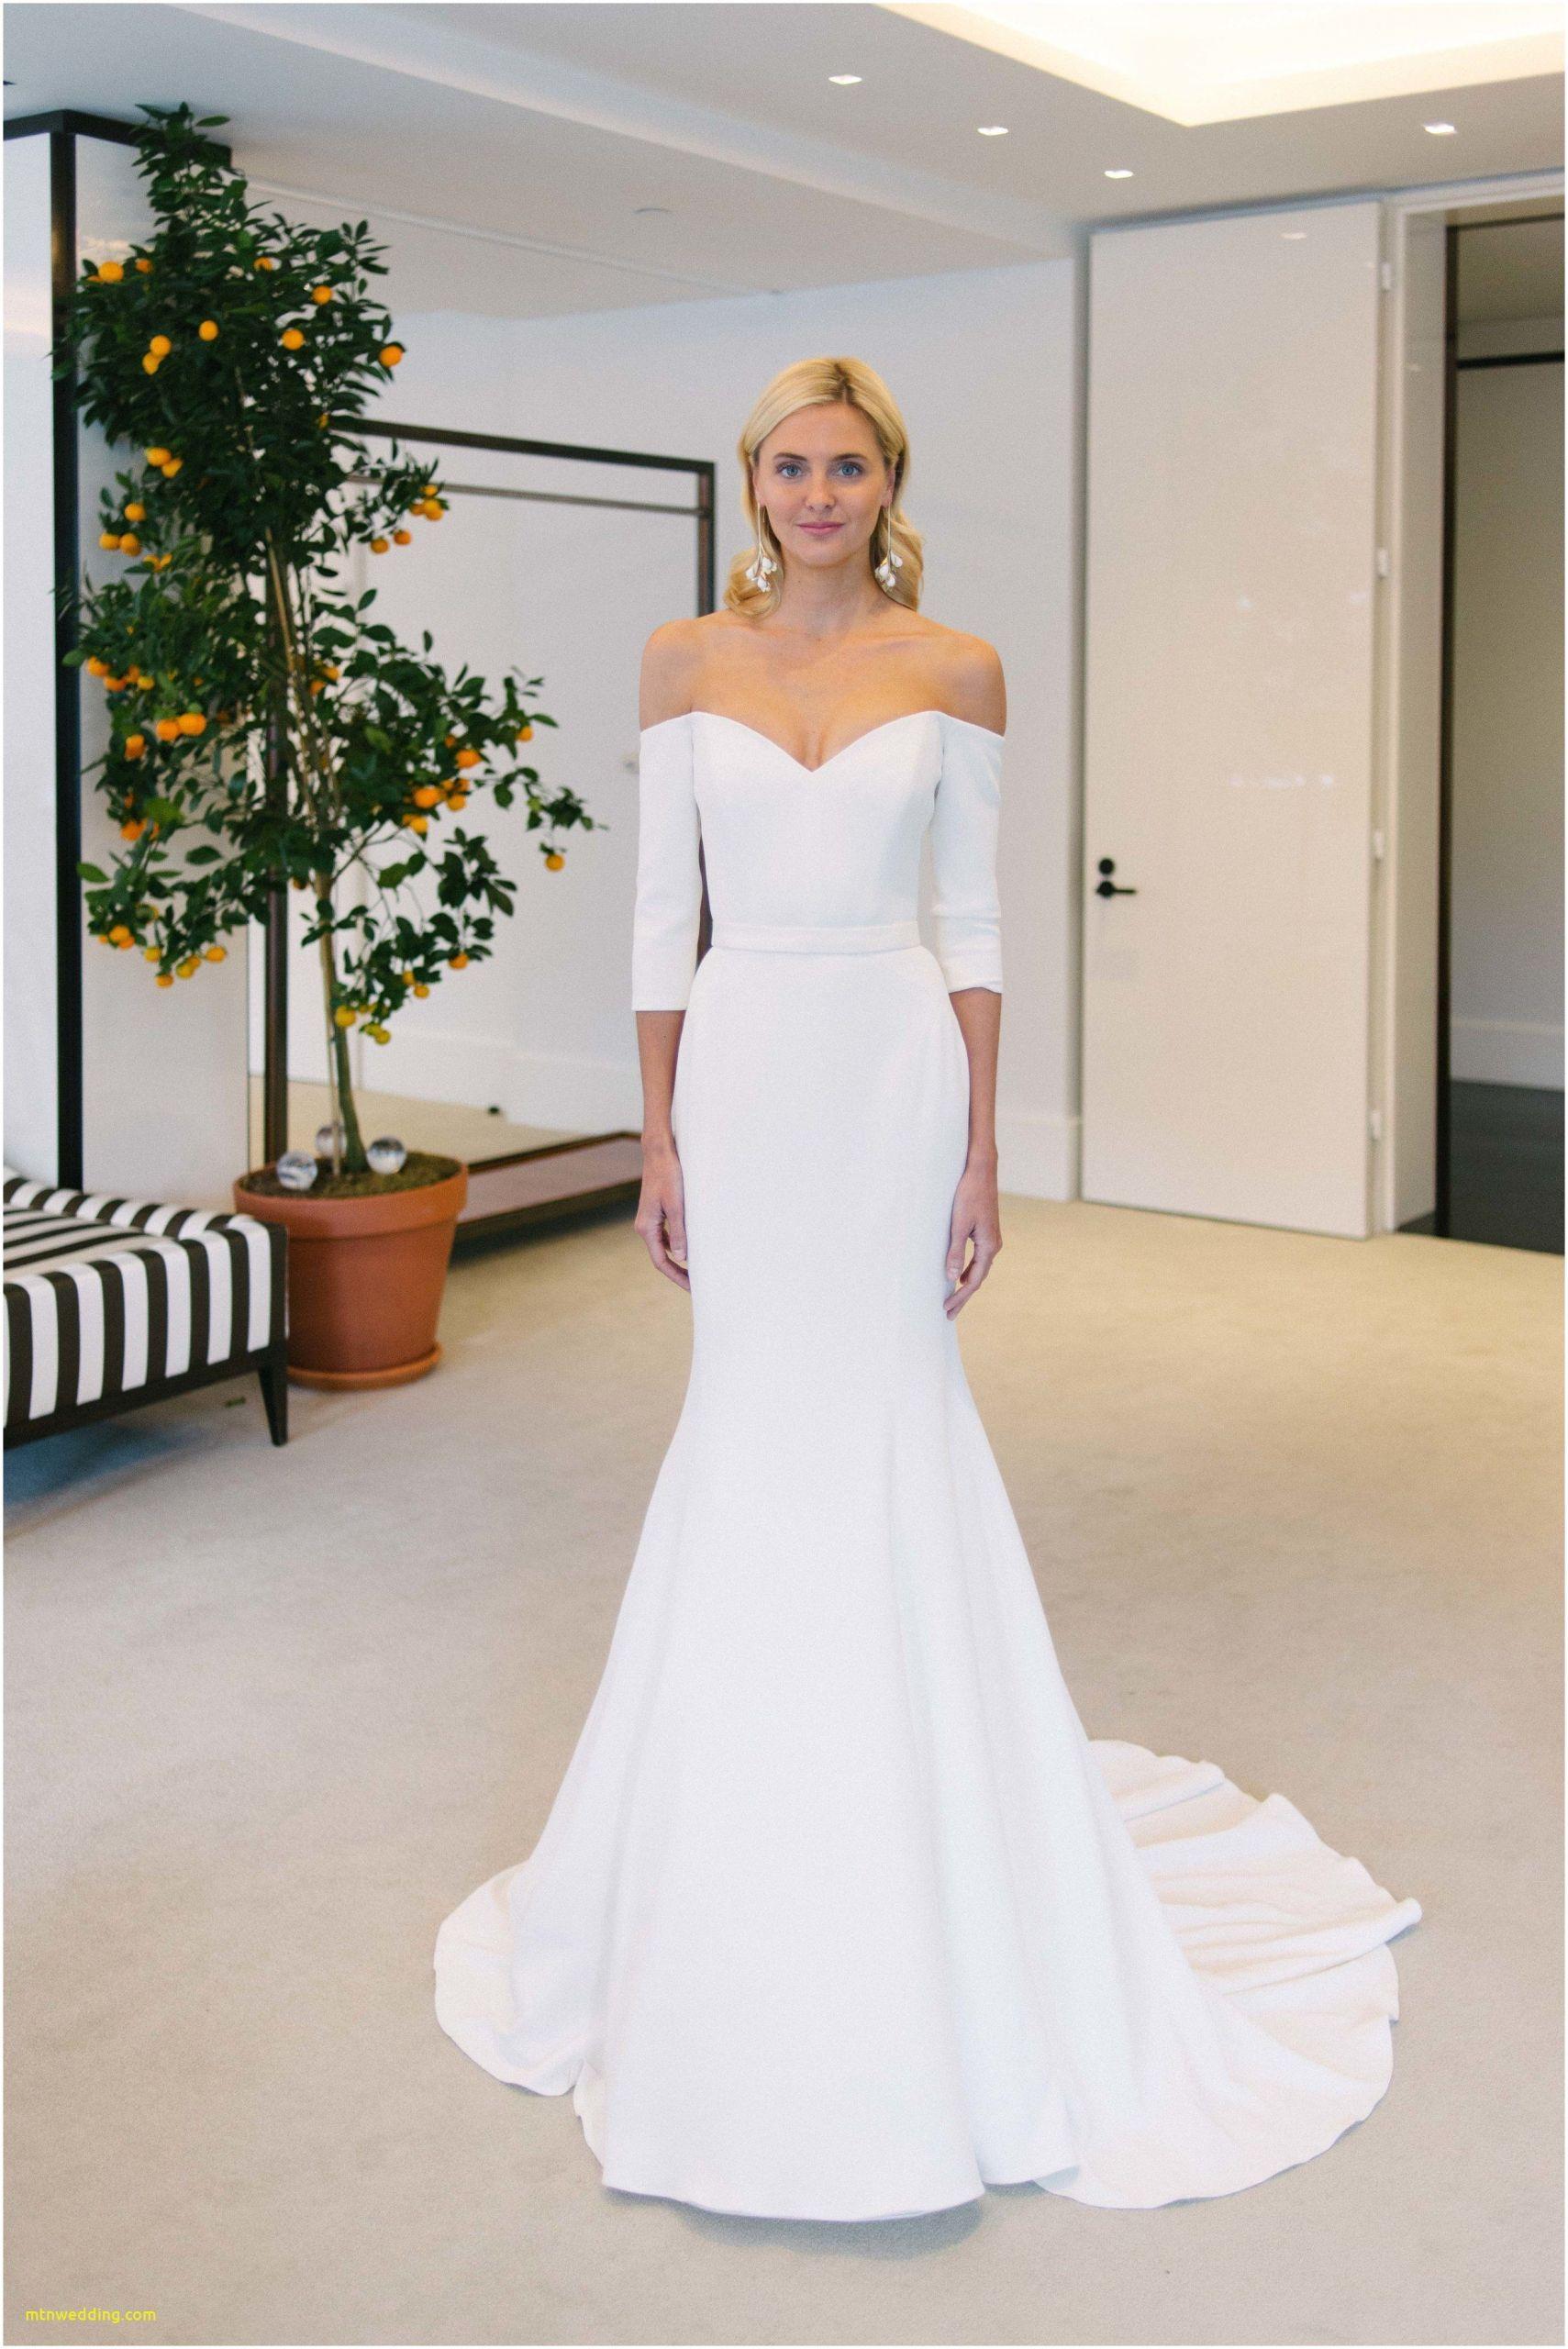 Remarkable Best Wedding Dresses For Short Brides White Bridal Dresses Best Wedding Dresses Satin Wedding